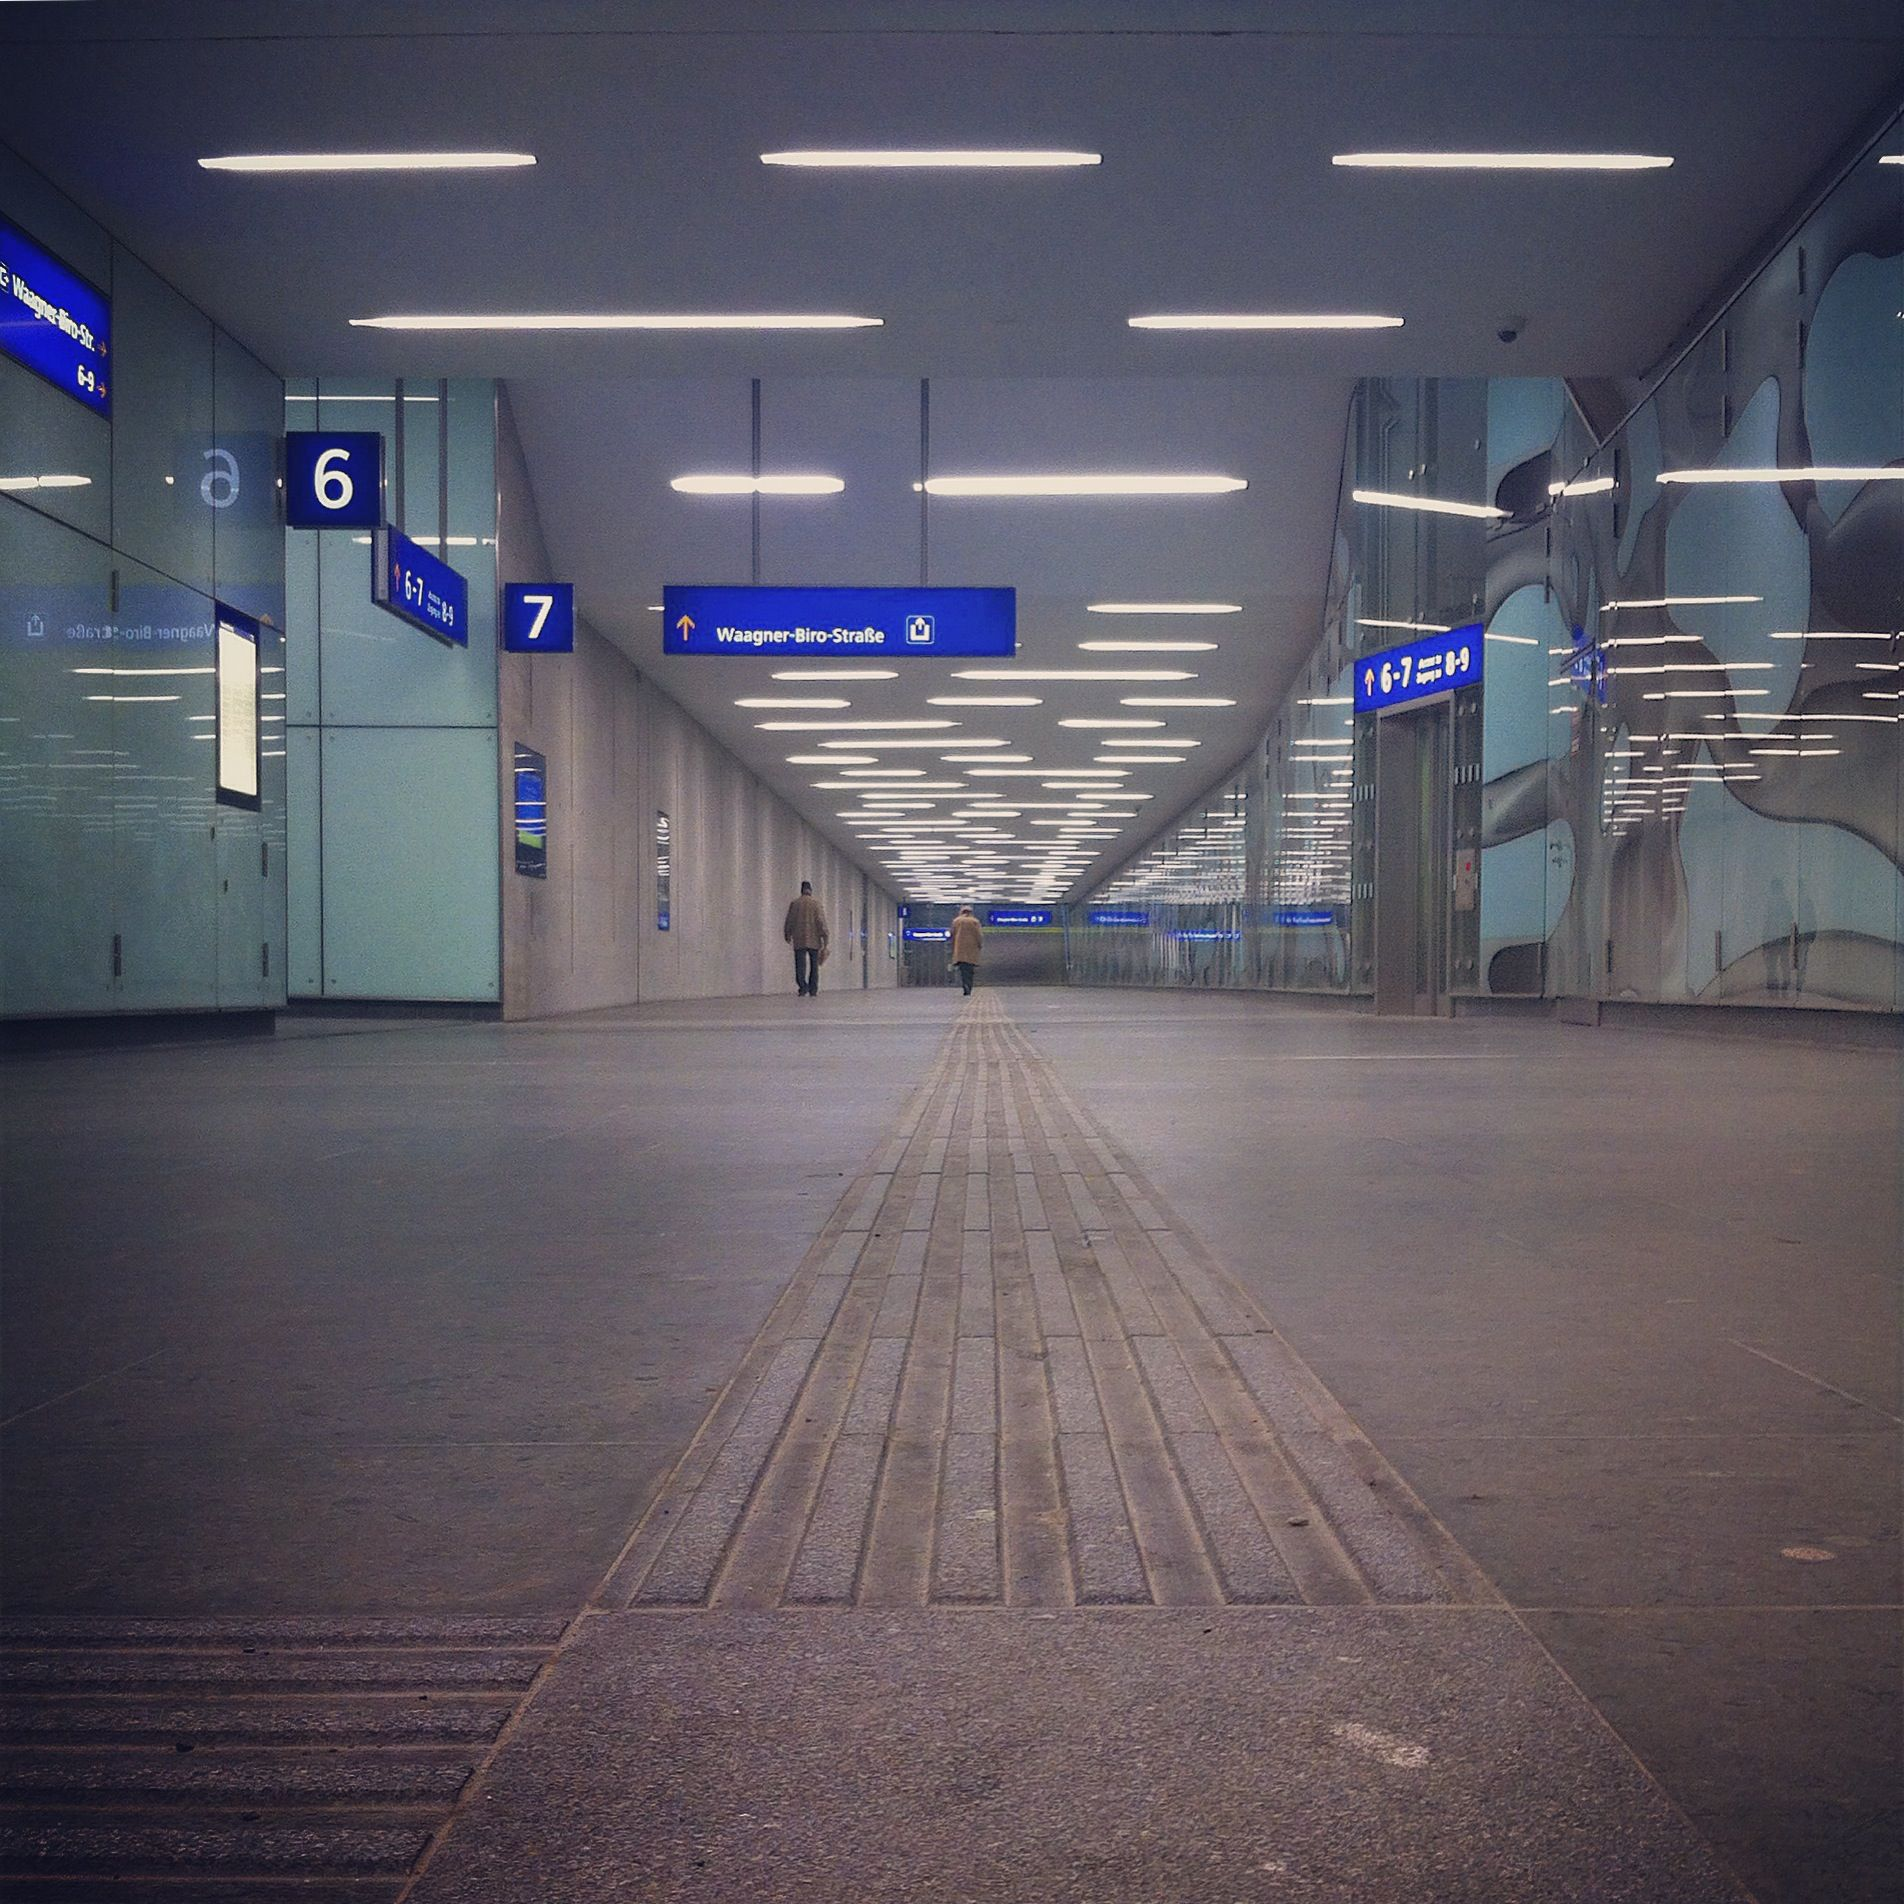 Personentunnel Hauptbahnhof So kommt man flott zu uns Zu Fuß